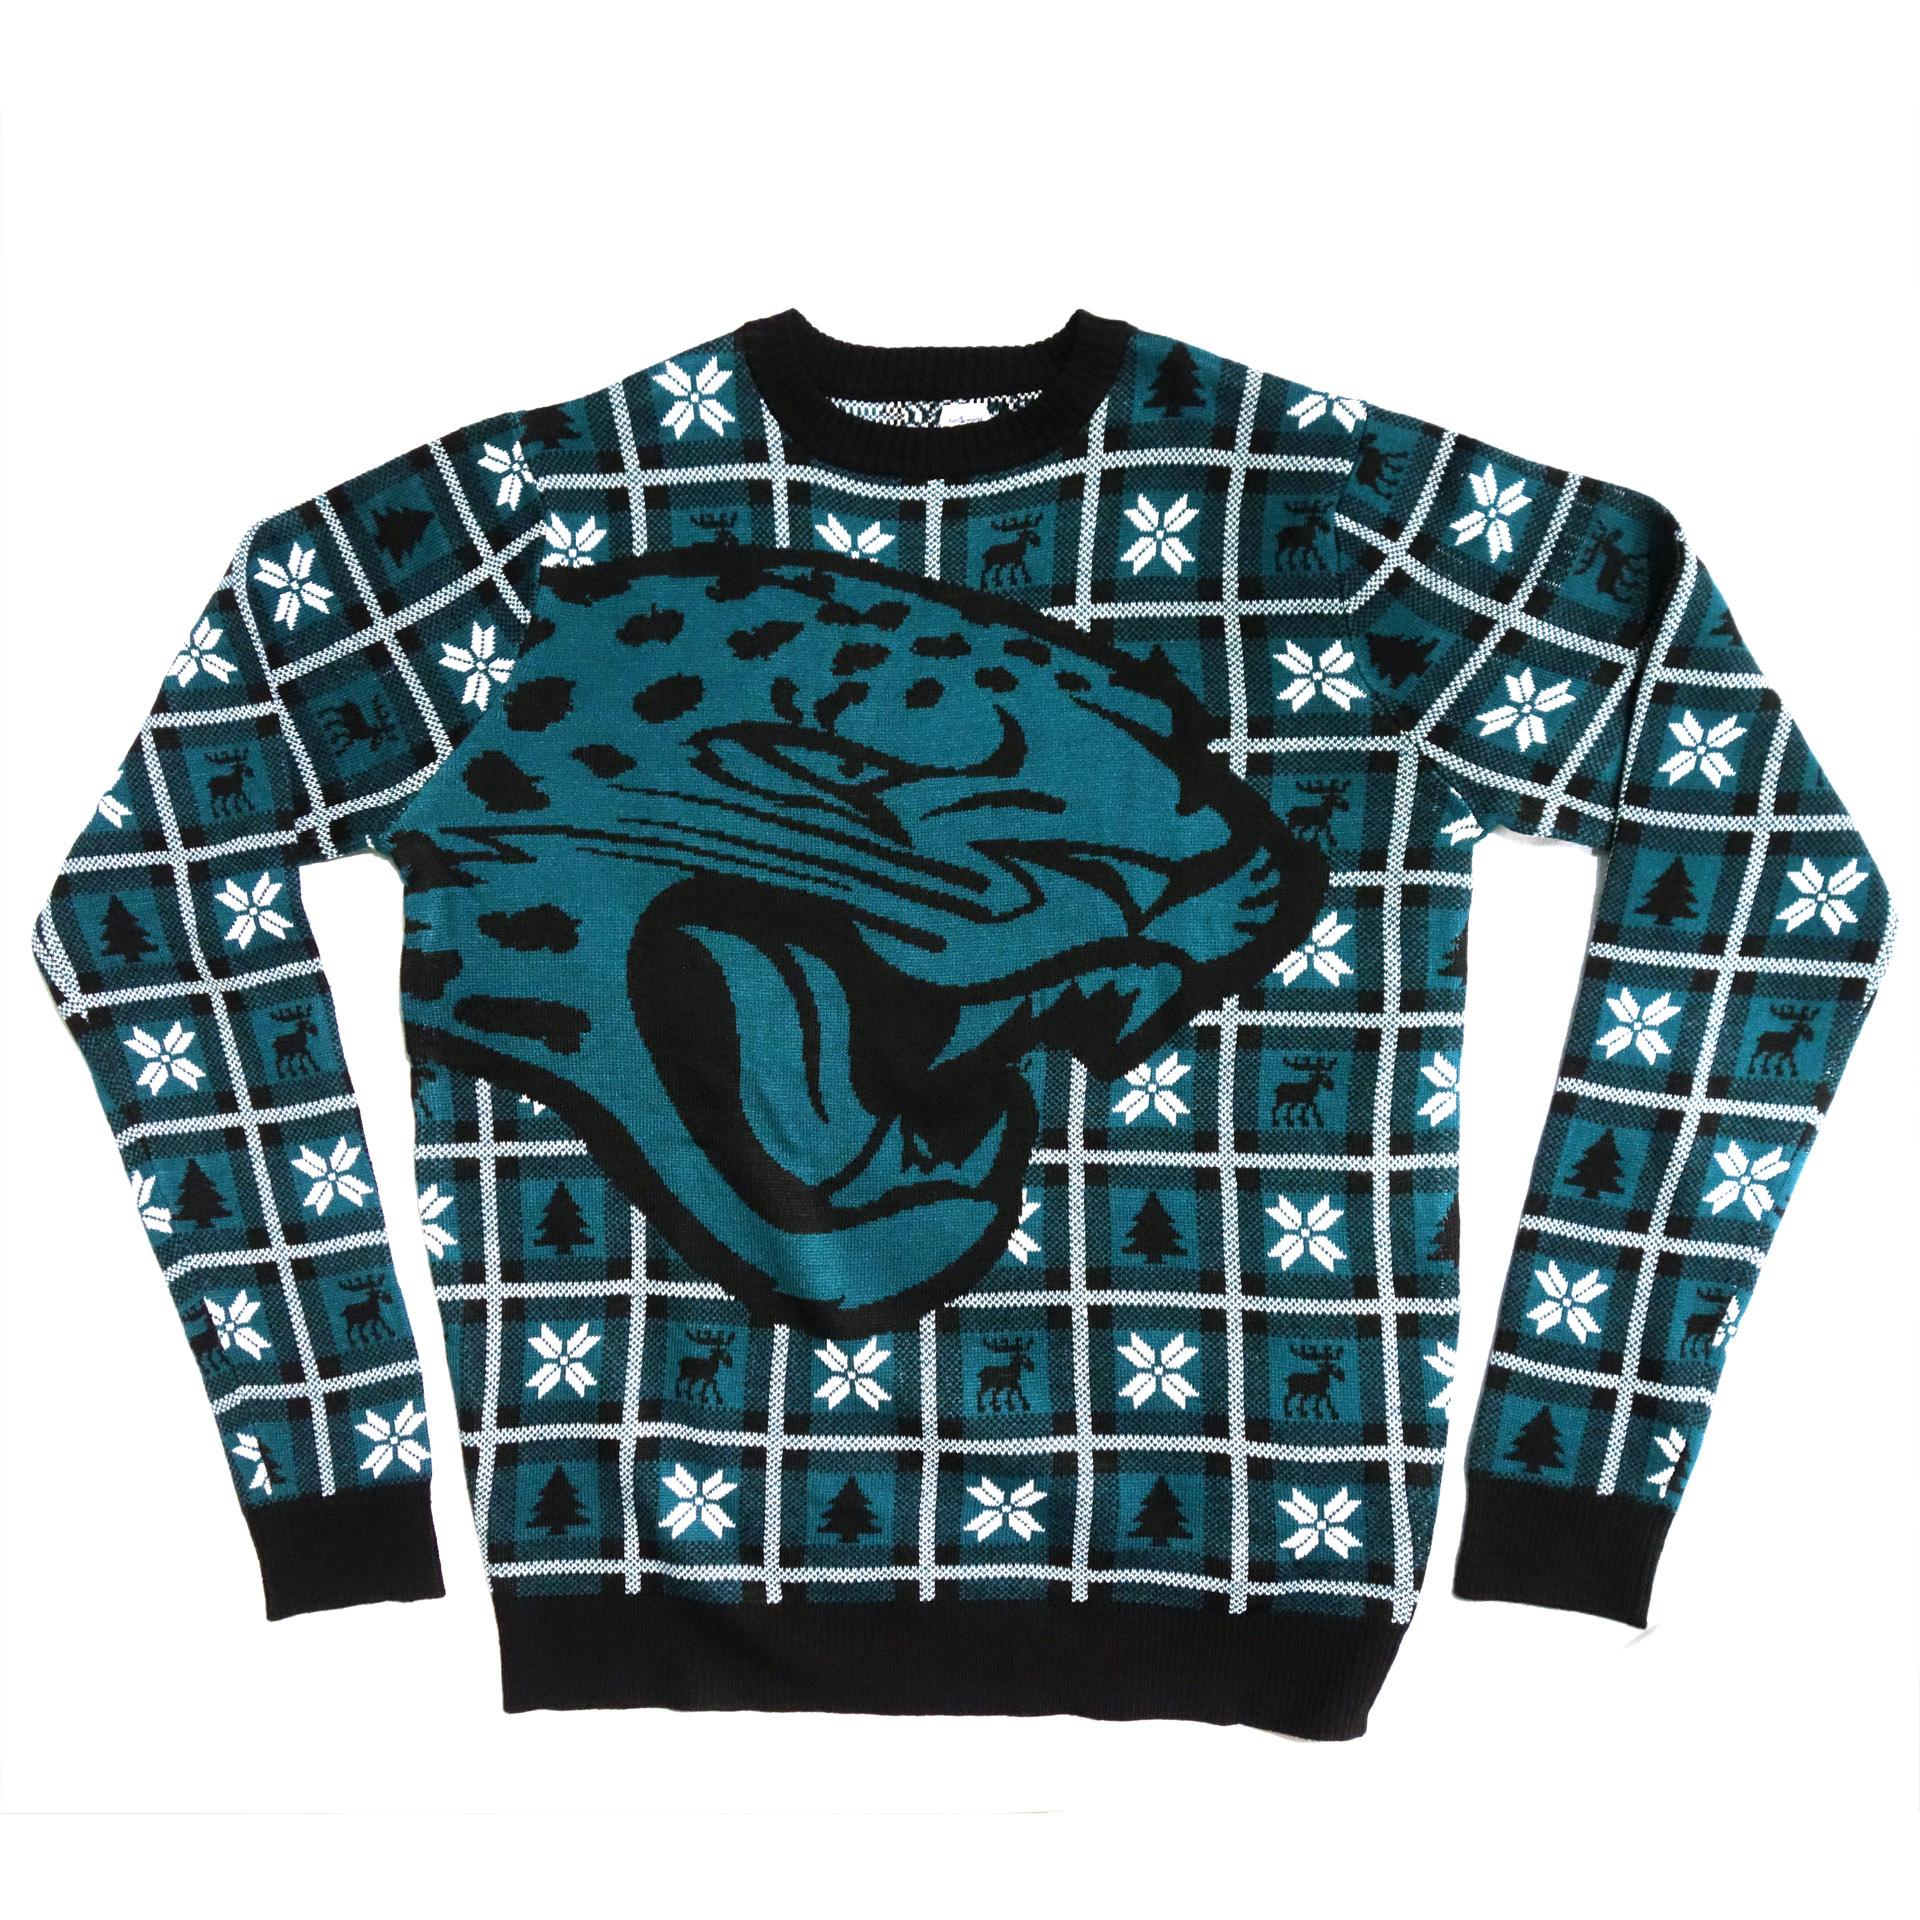 NFL Pullover Christmas Jasonville Jaguars Ugly Sweater